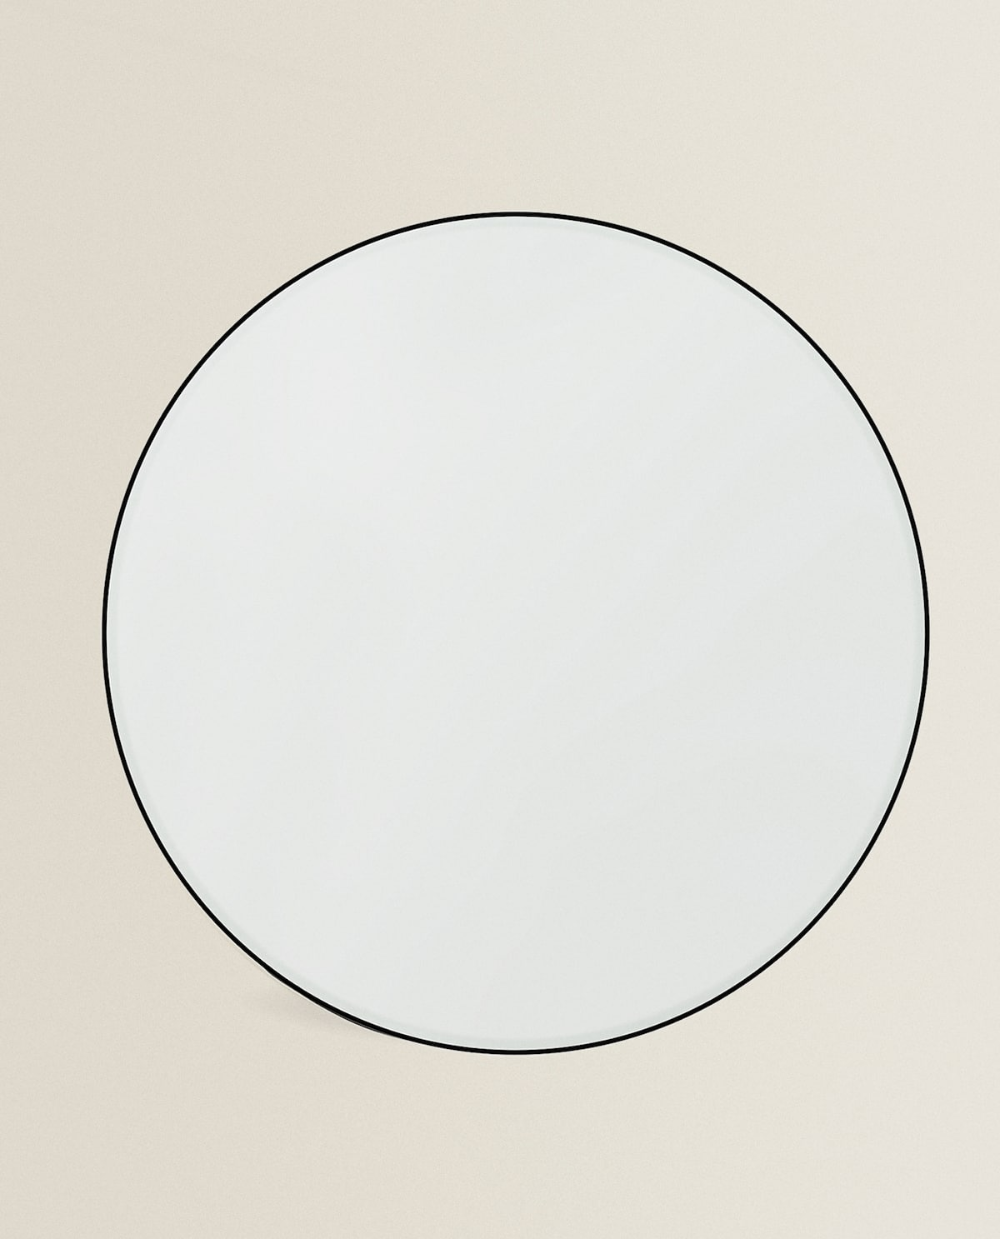 Round Mirror With Metal Frame In 2020 Large Round Mirror Round